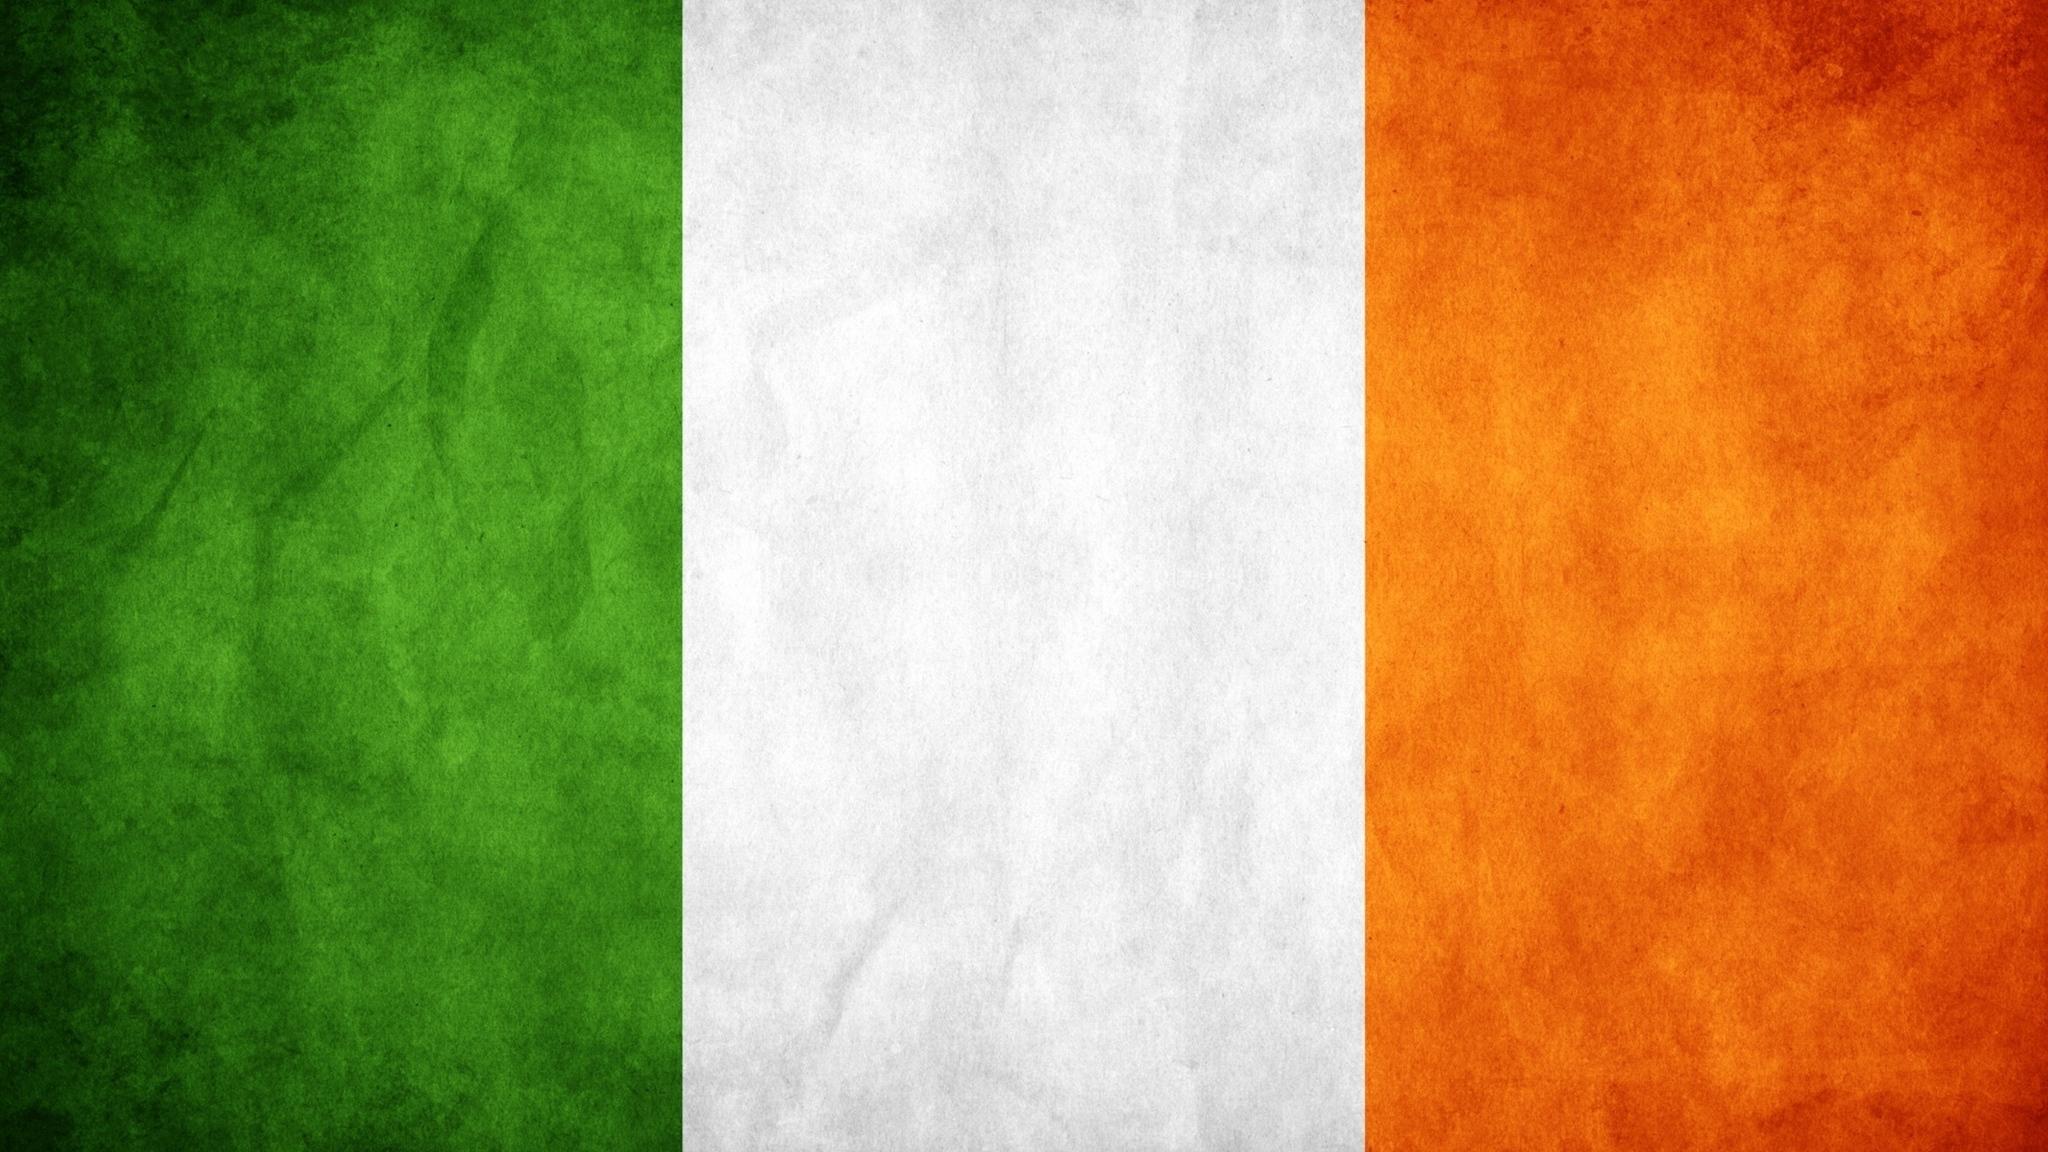 Download wallpaper 2048x1152 ireland flag colors background 2048x1152